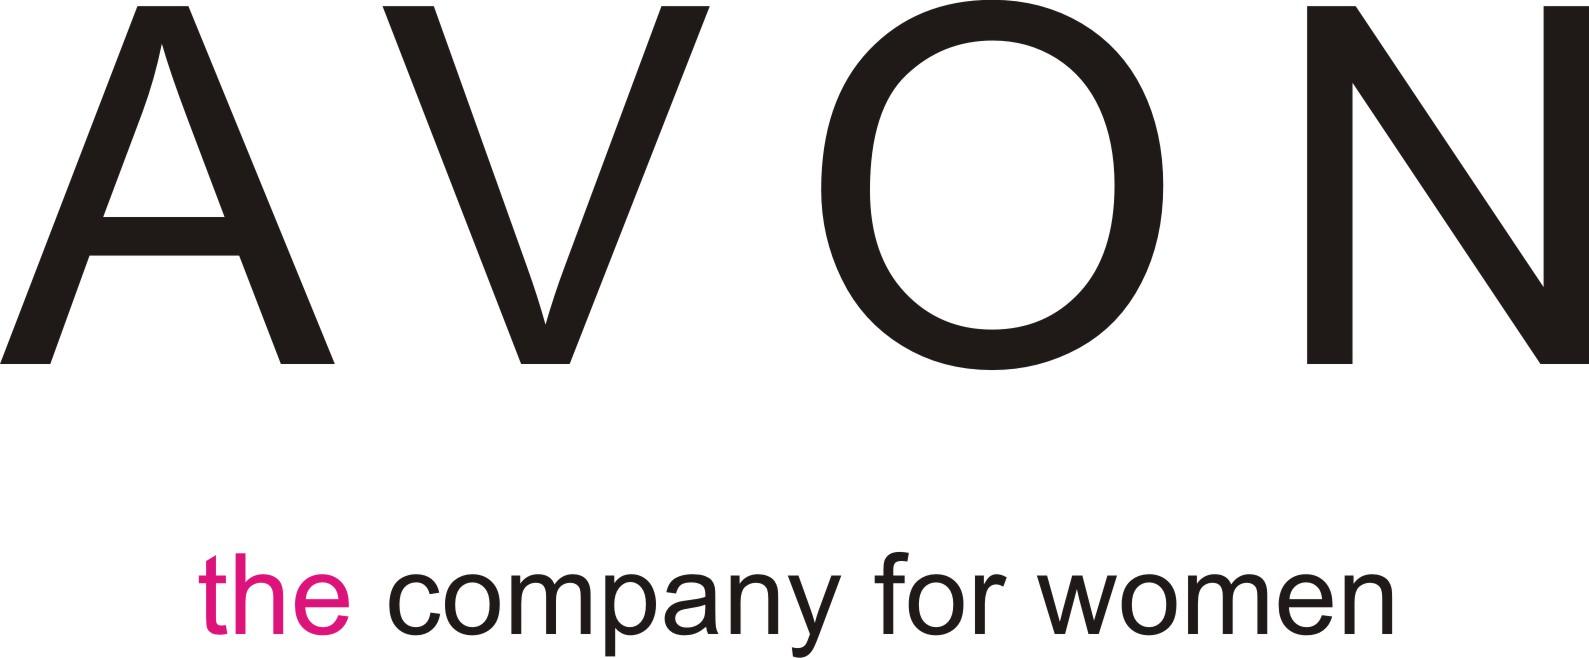 avon-logo2.jpg